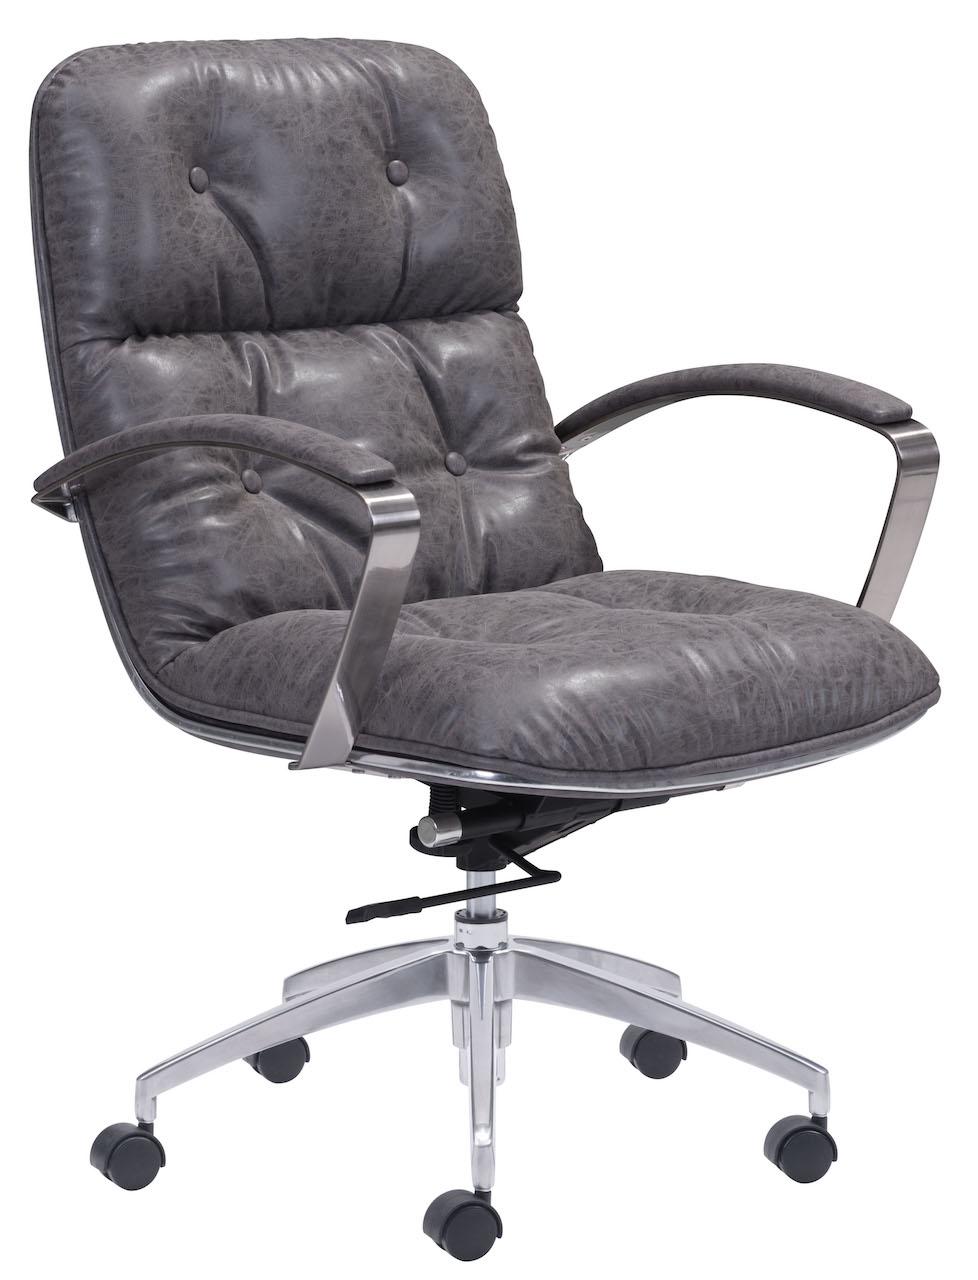 avenue-office-chair-vintage-gray.jpg